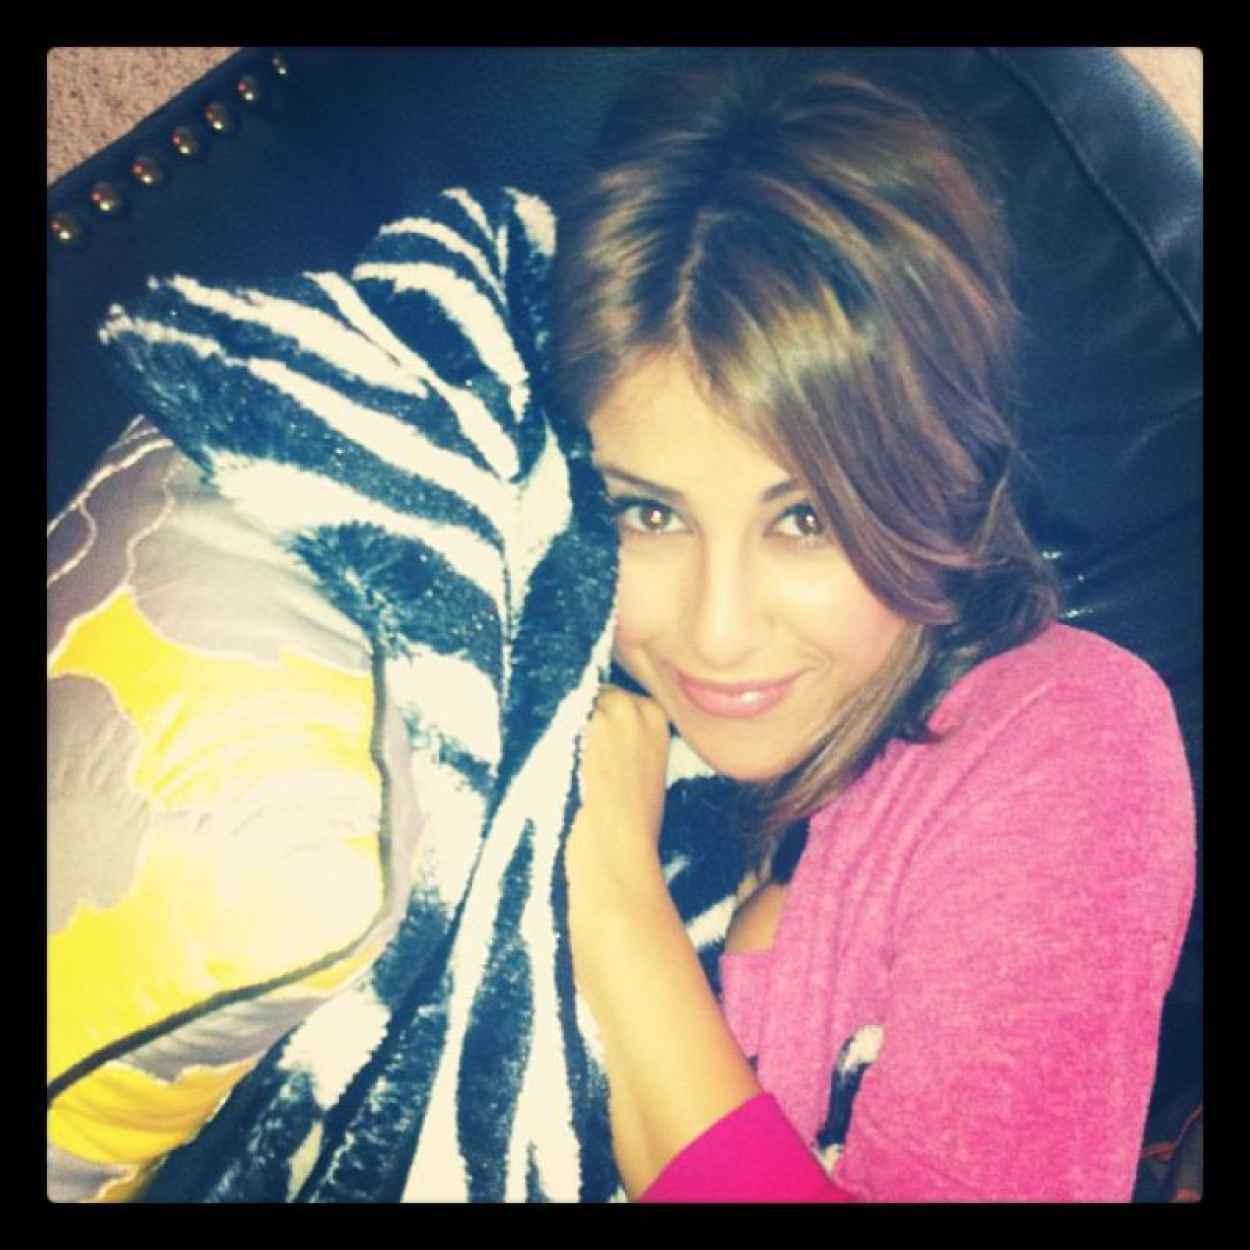 Daniella Monet Twitter Photos-1